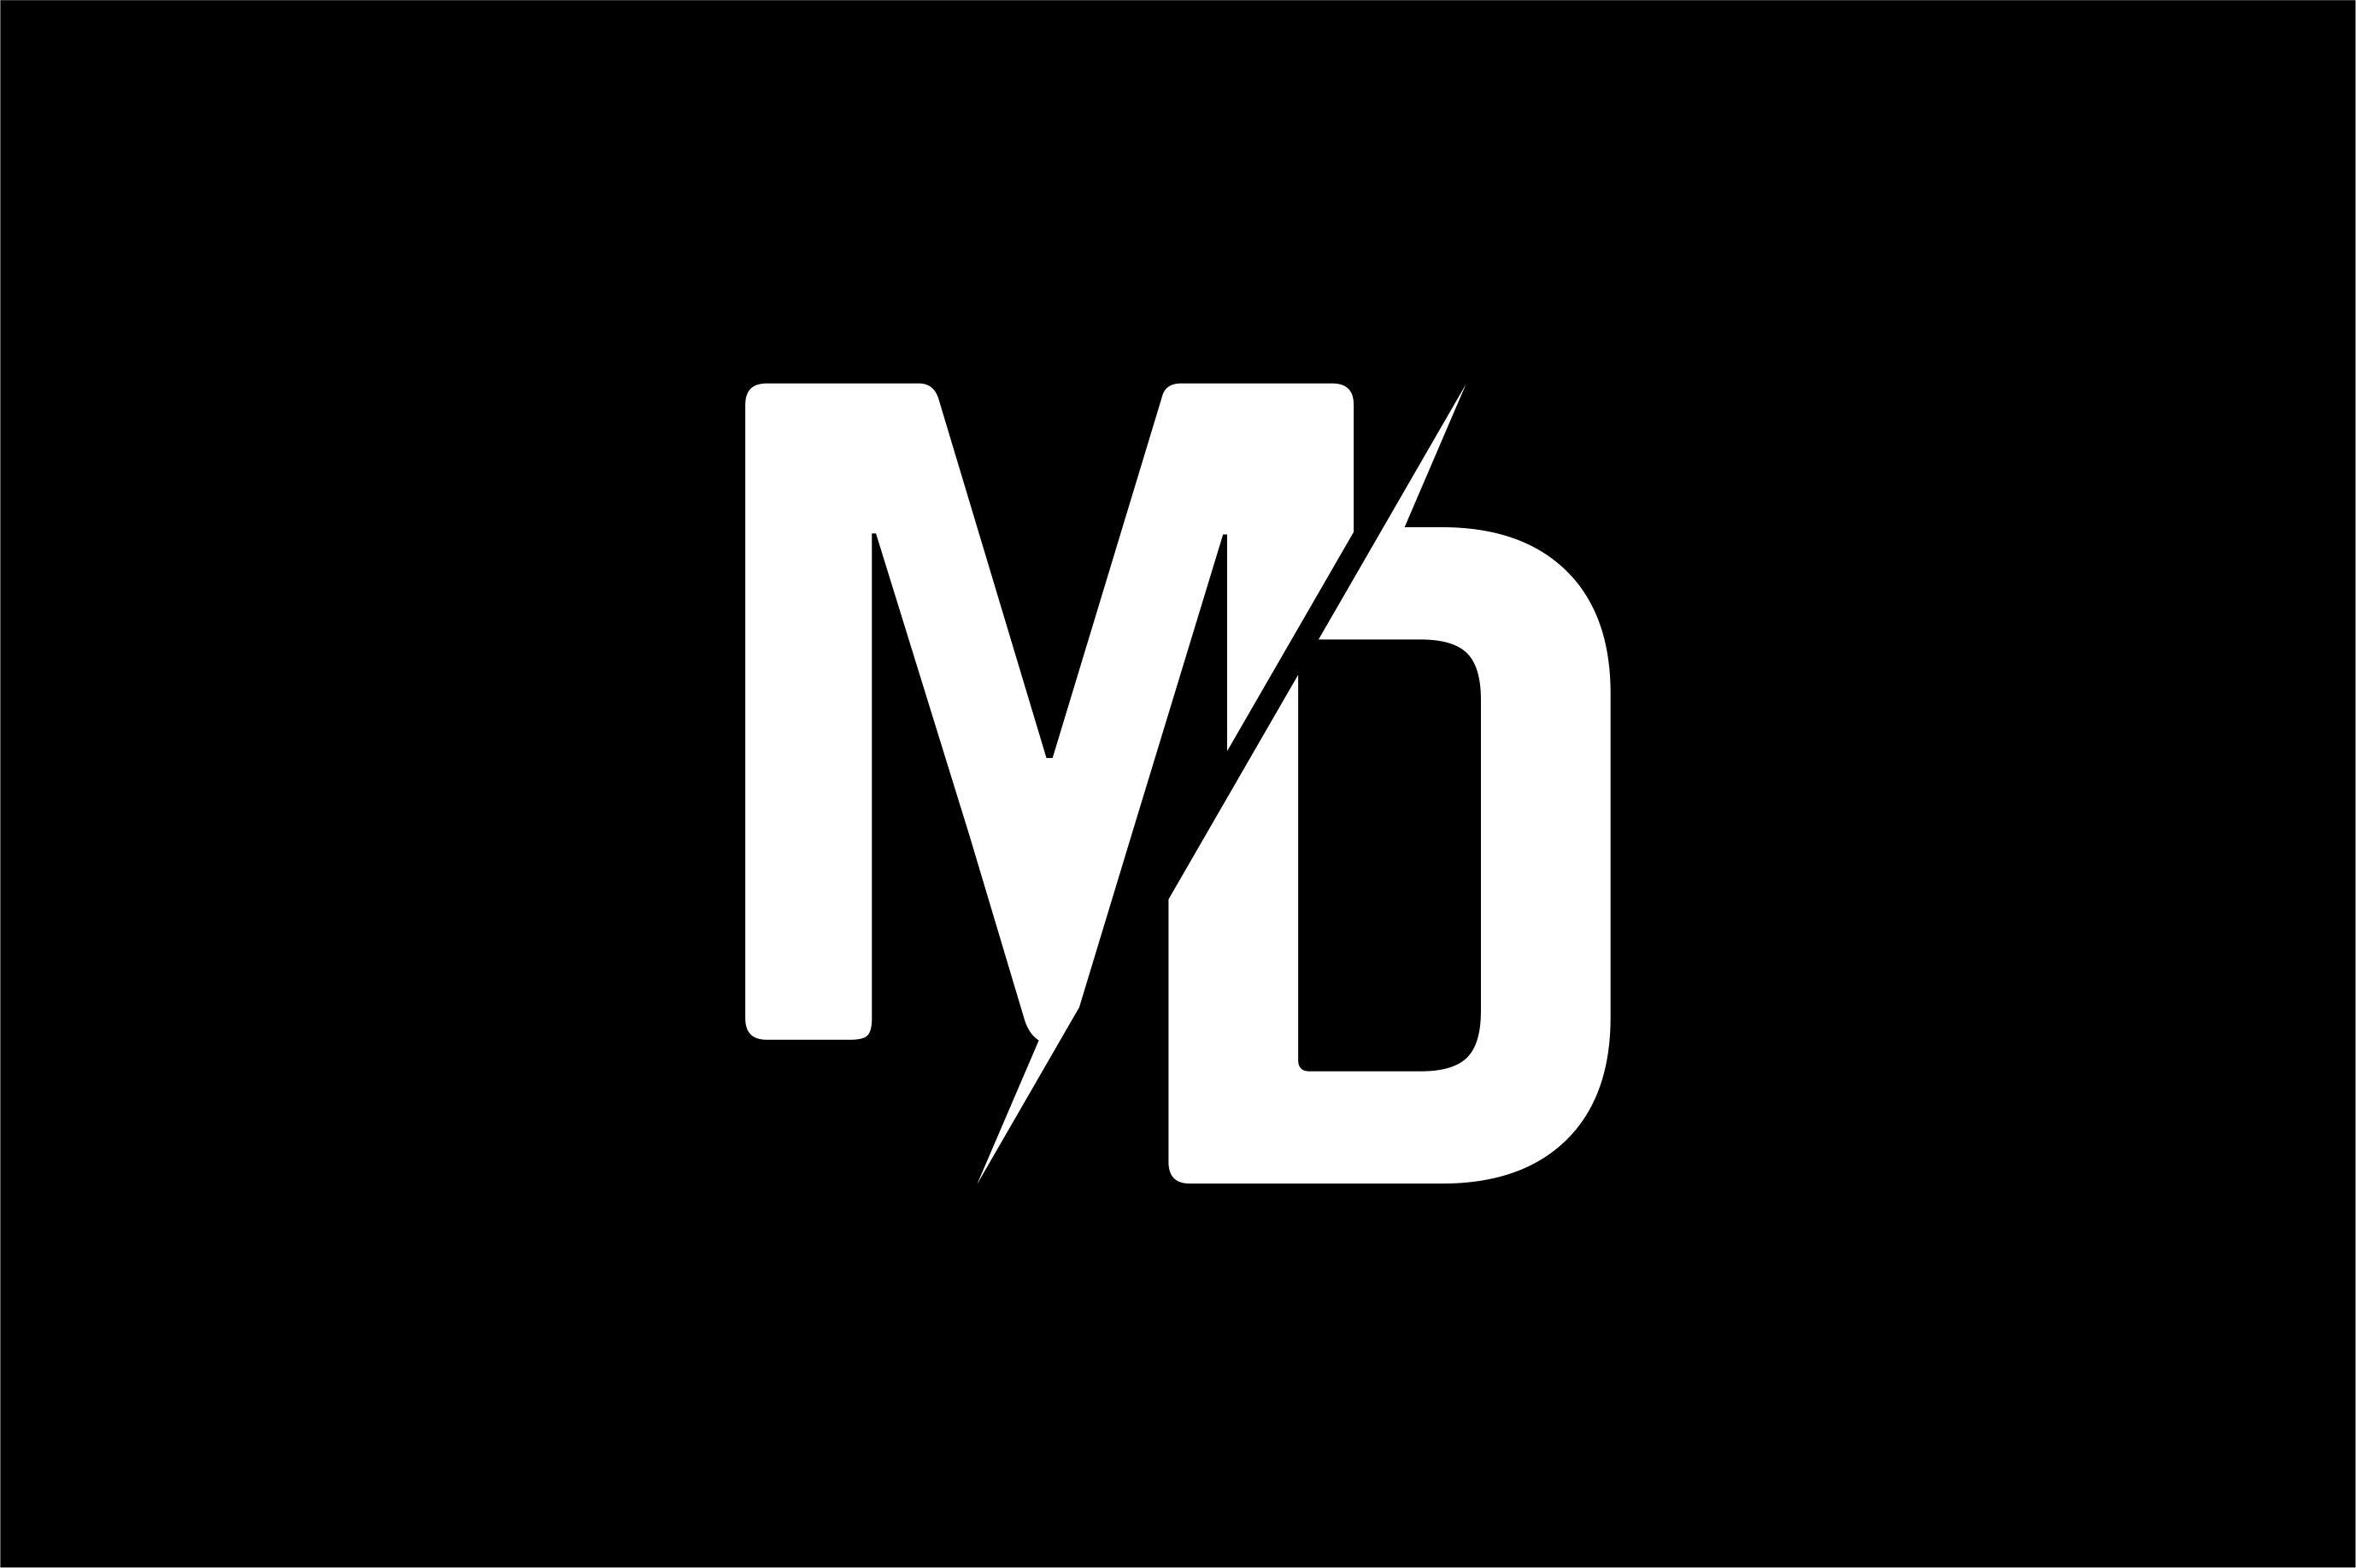 Monogram MD Logo Design in 2020 Logo design, Logos